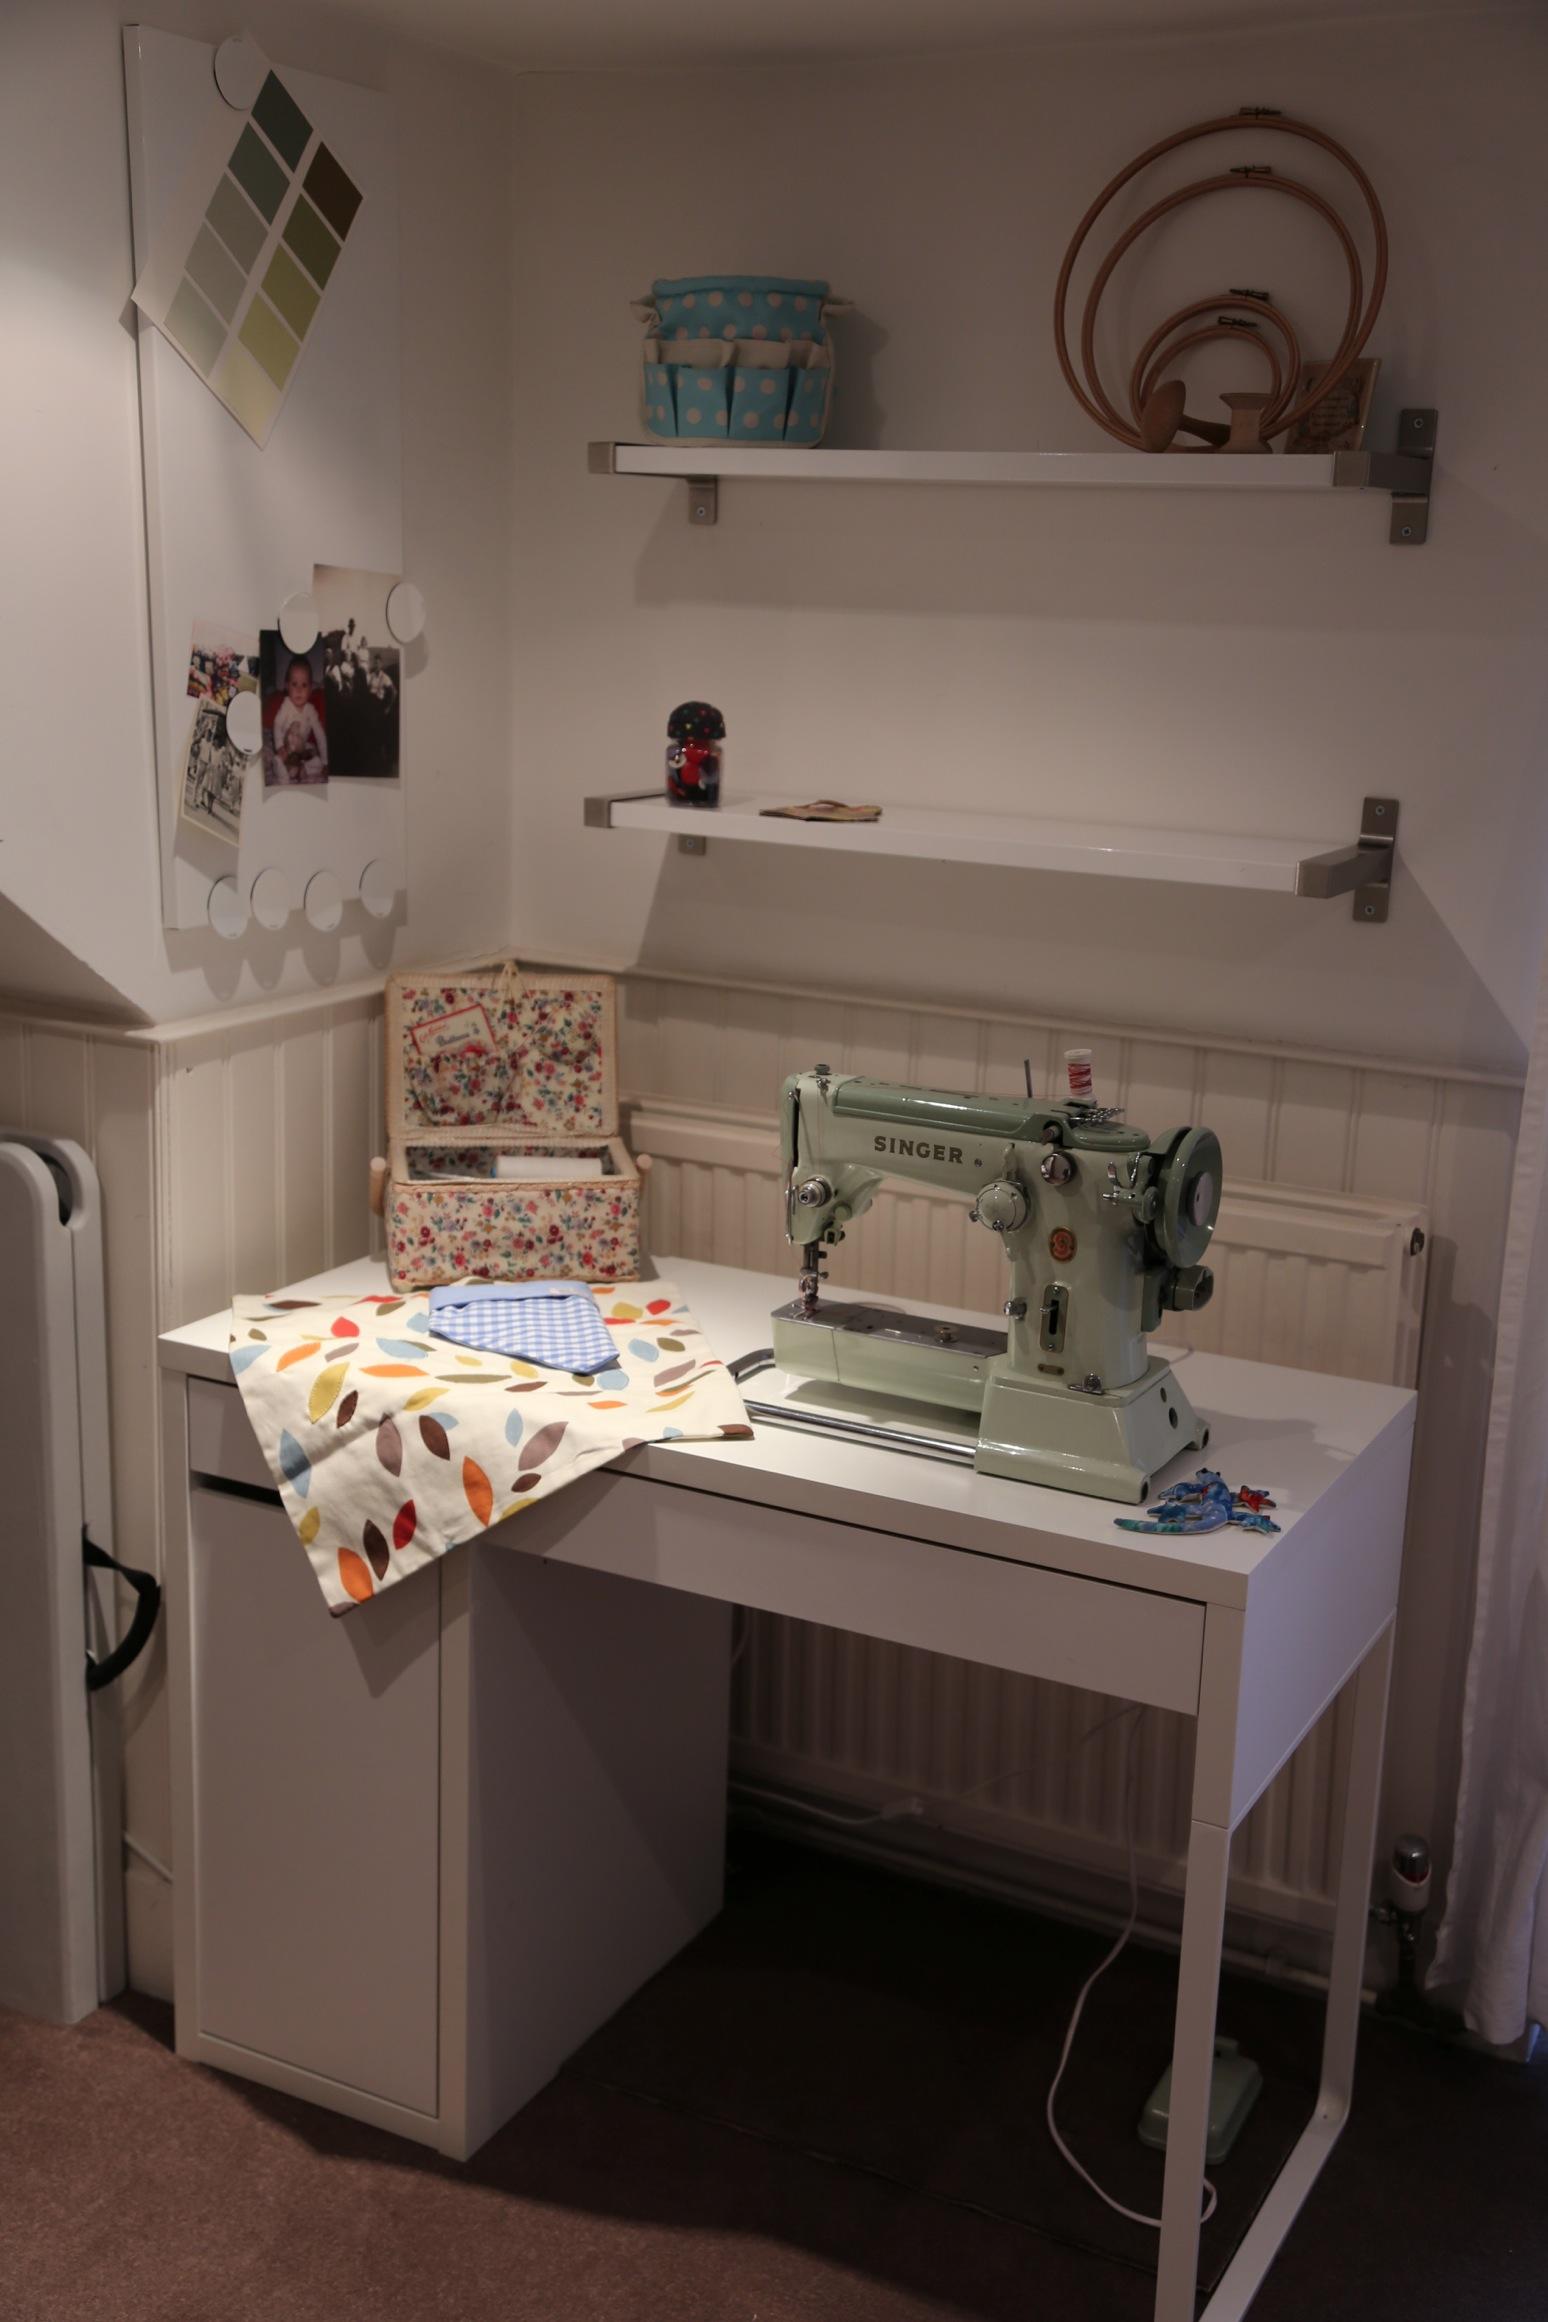 Singer 320k Sewing Machine Tinyinc 401 Threading Diagram My Desk